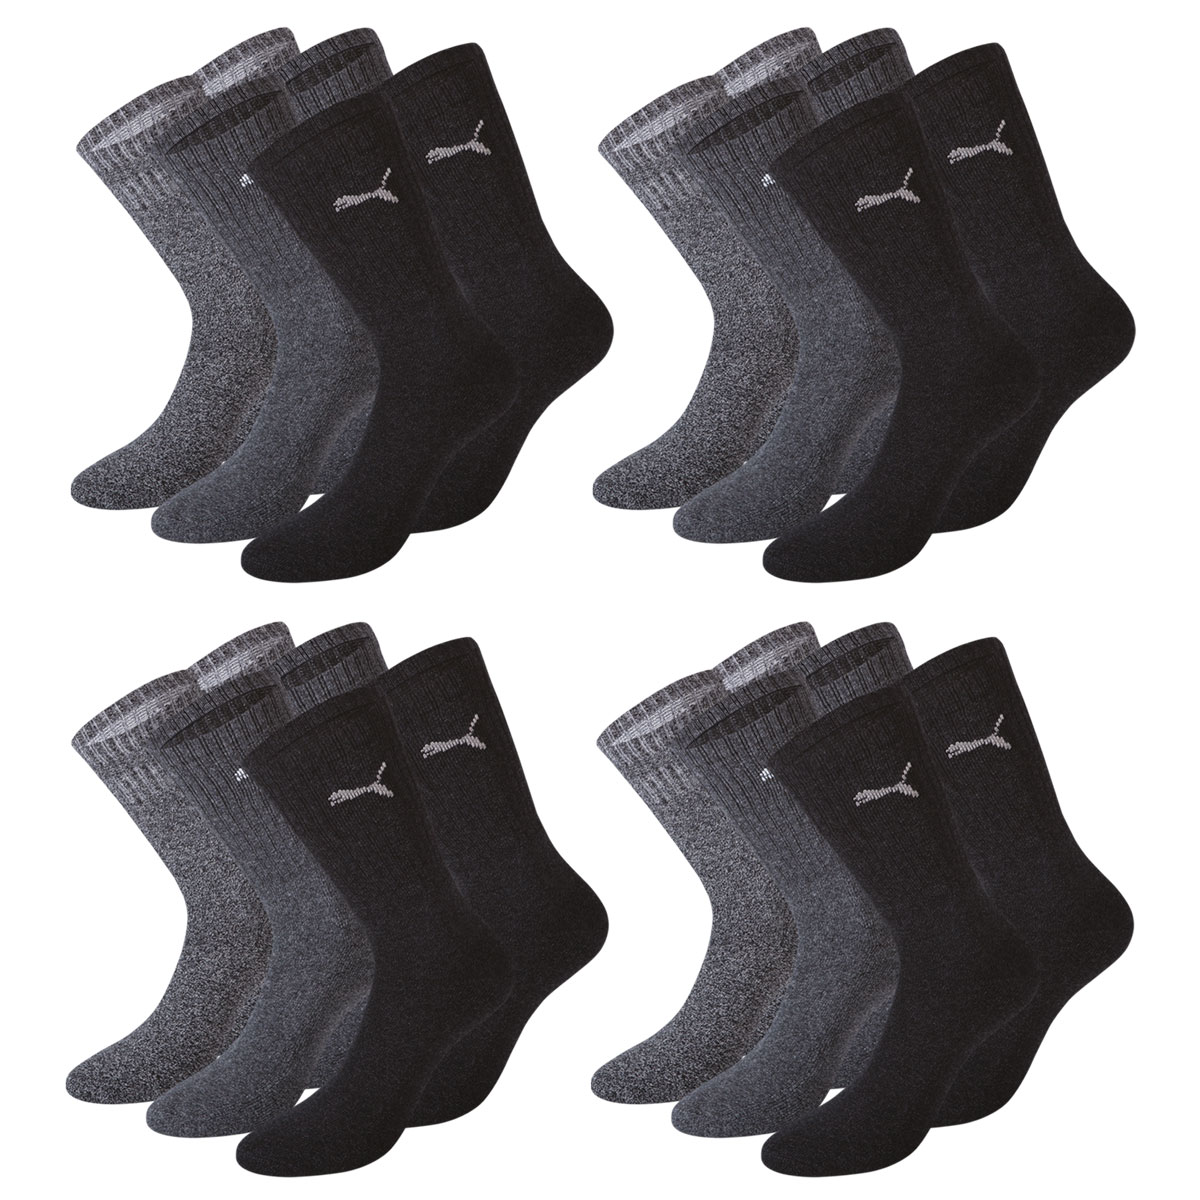 12 Paar Puma Socken, anthrazit / grau